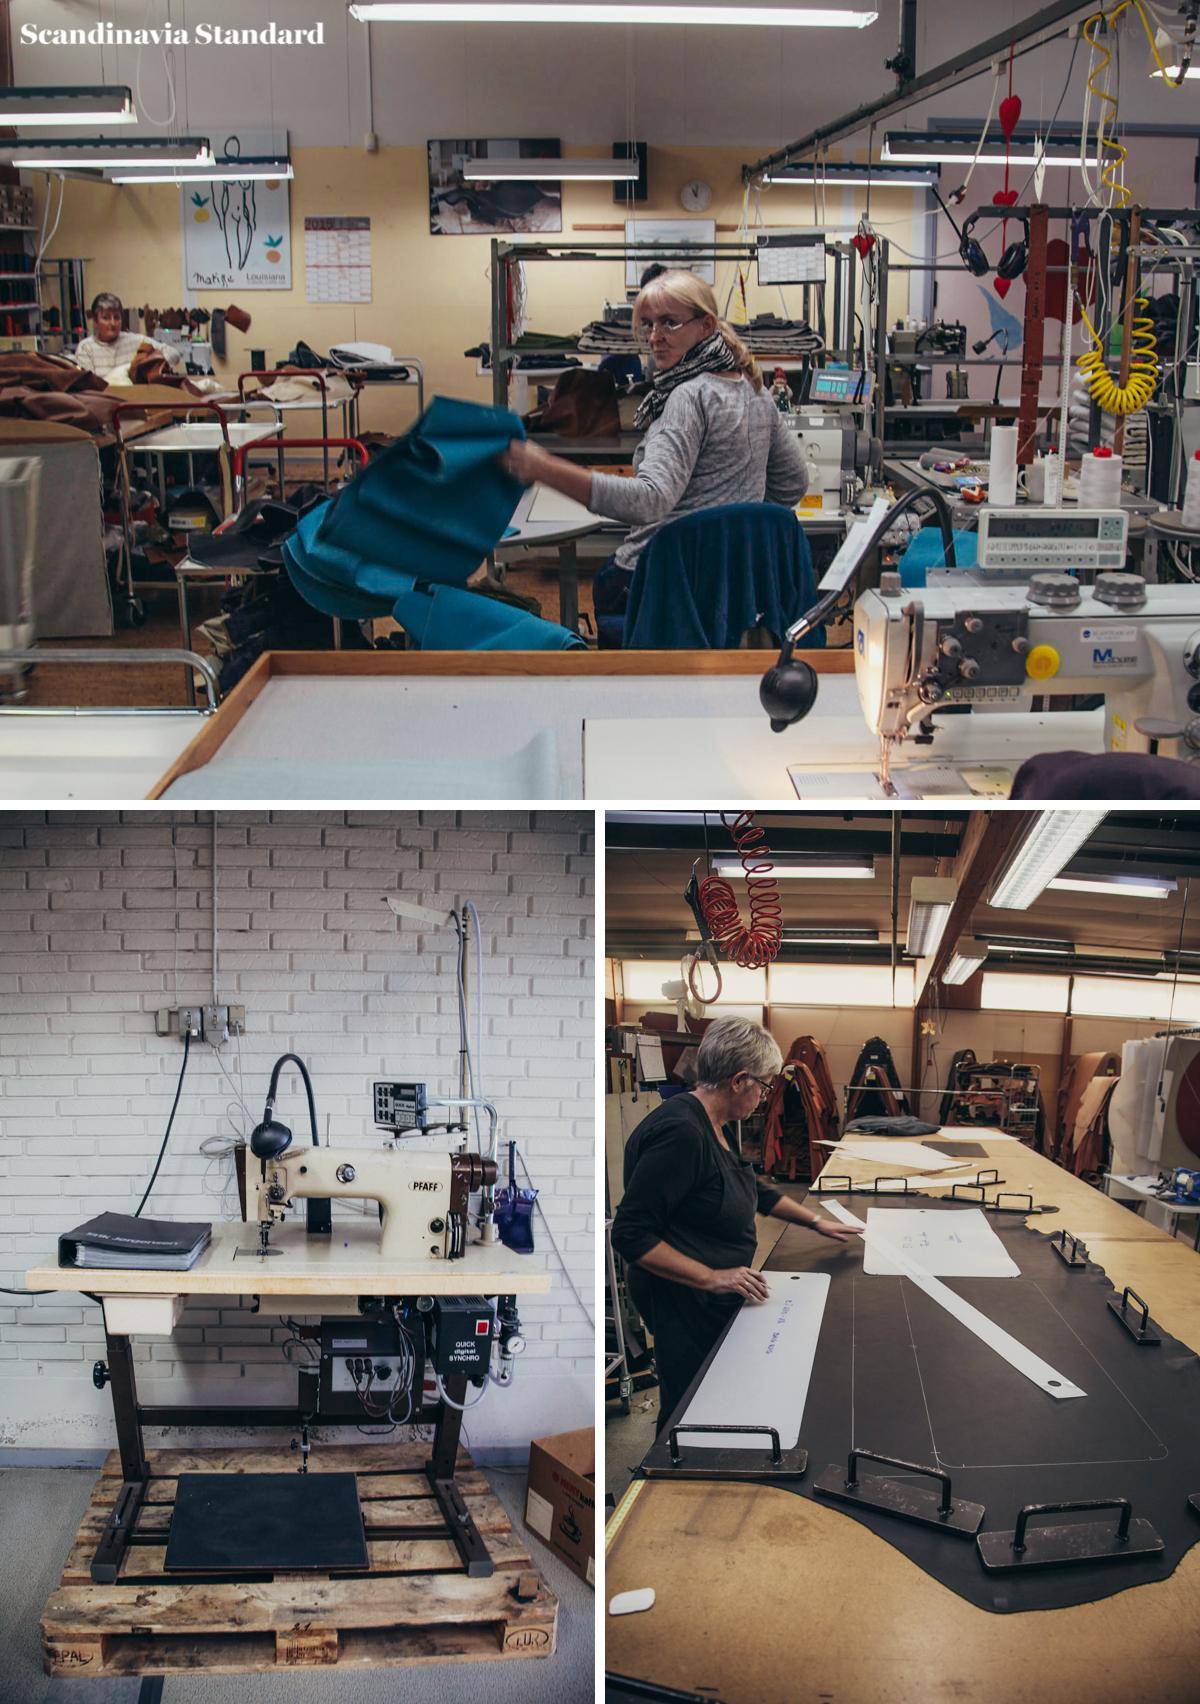 Skilled Workers Delphi Sofa Scandinavia Standard